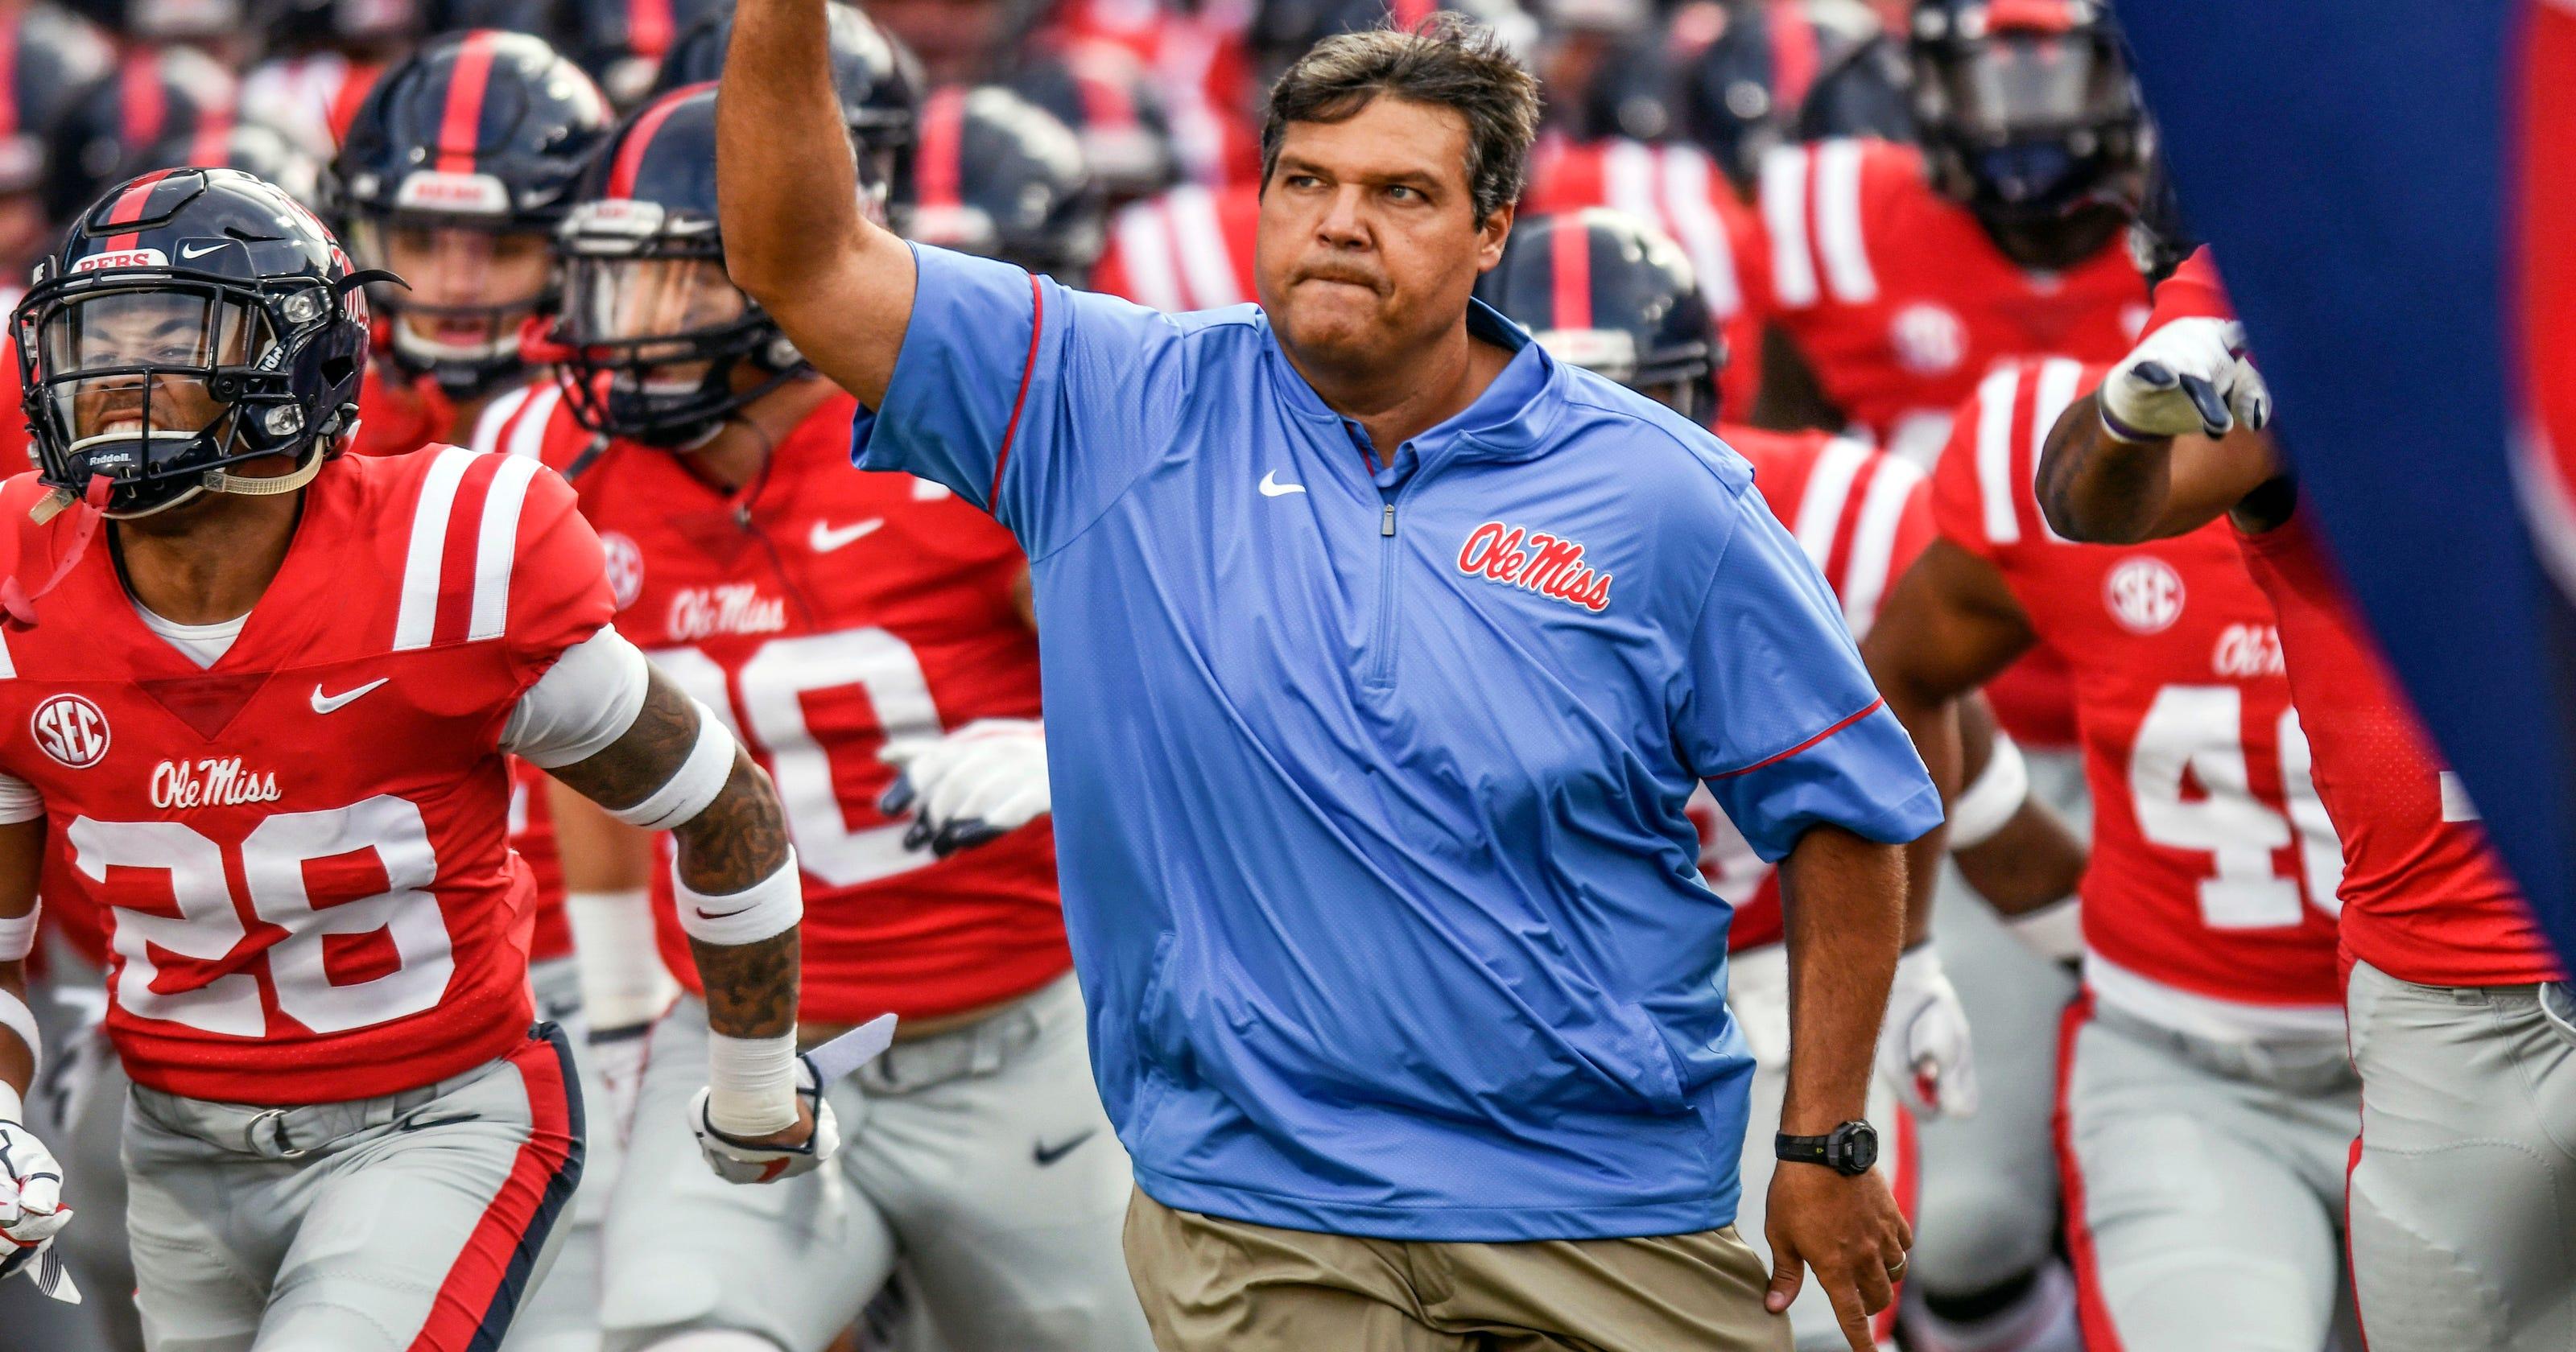 Matt Luke ready to lead Mississippi resurgence after NCAA turmoil 07c965a7f